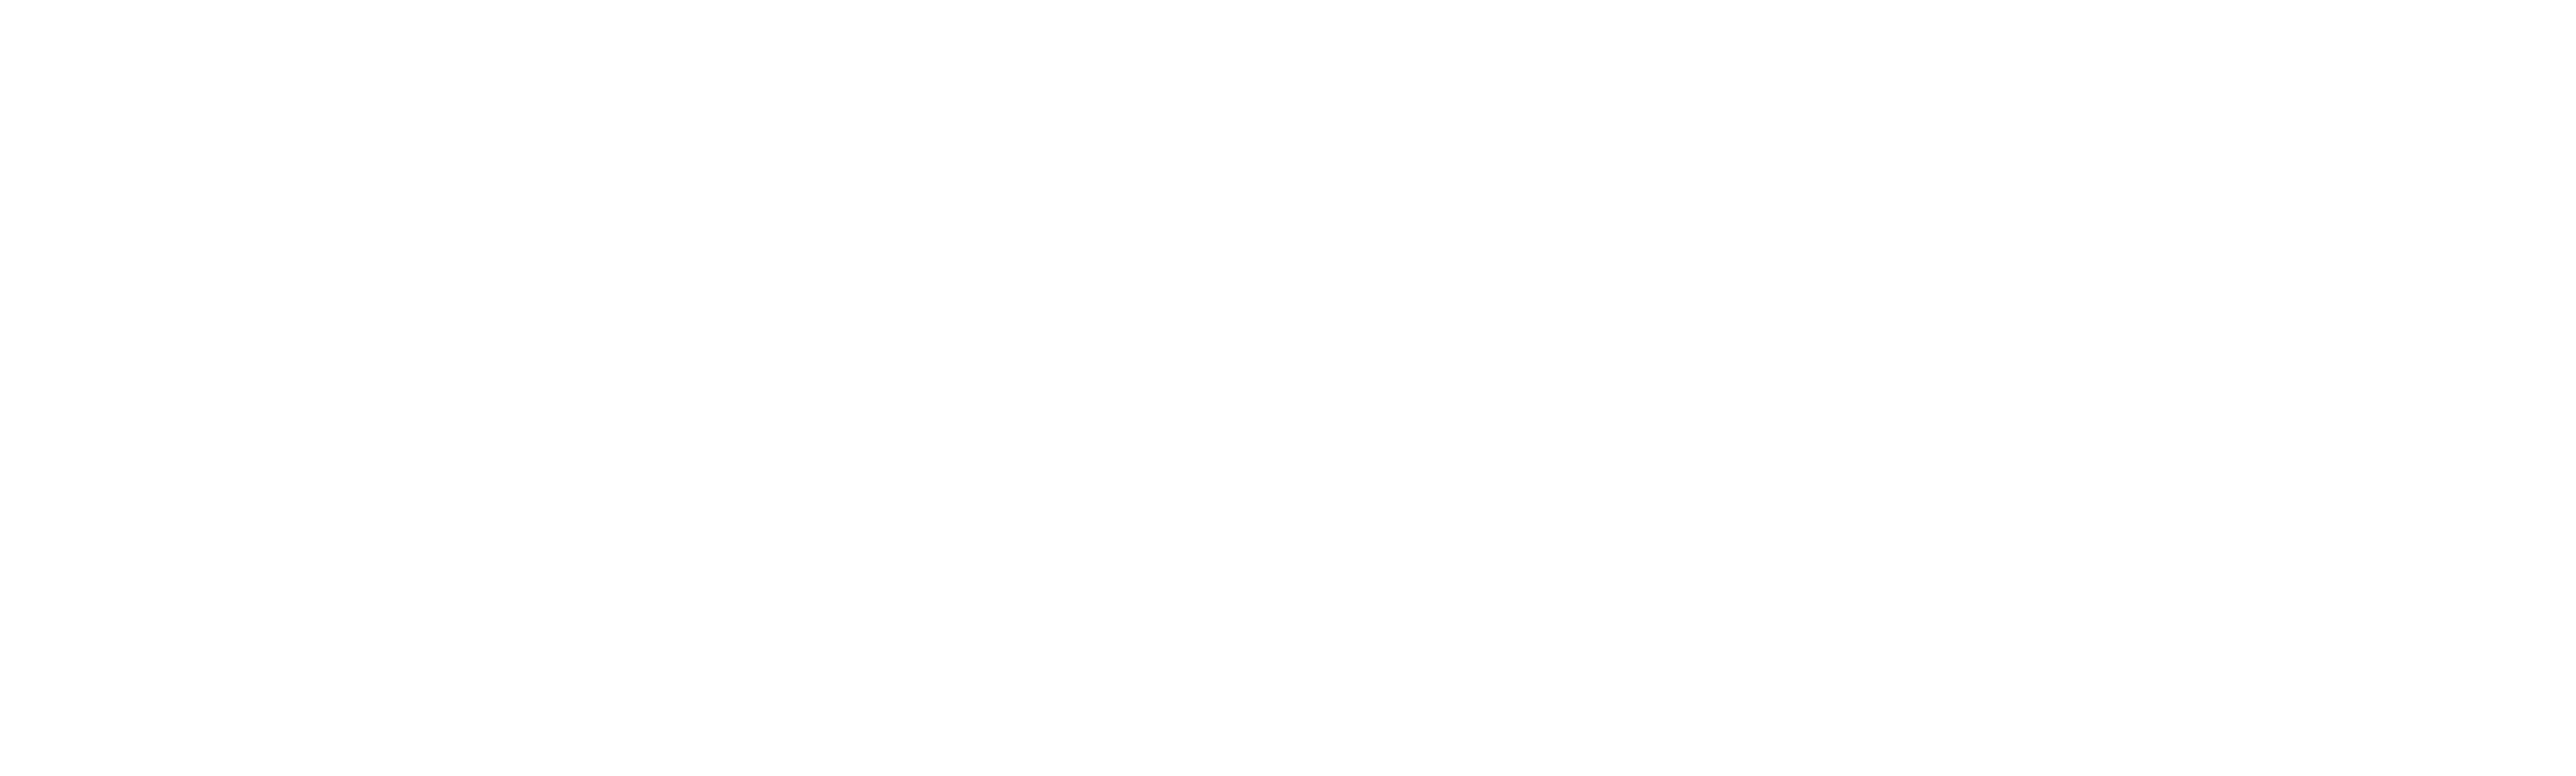 7. Iserlohner U15 Hallenmasters